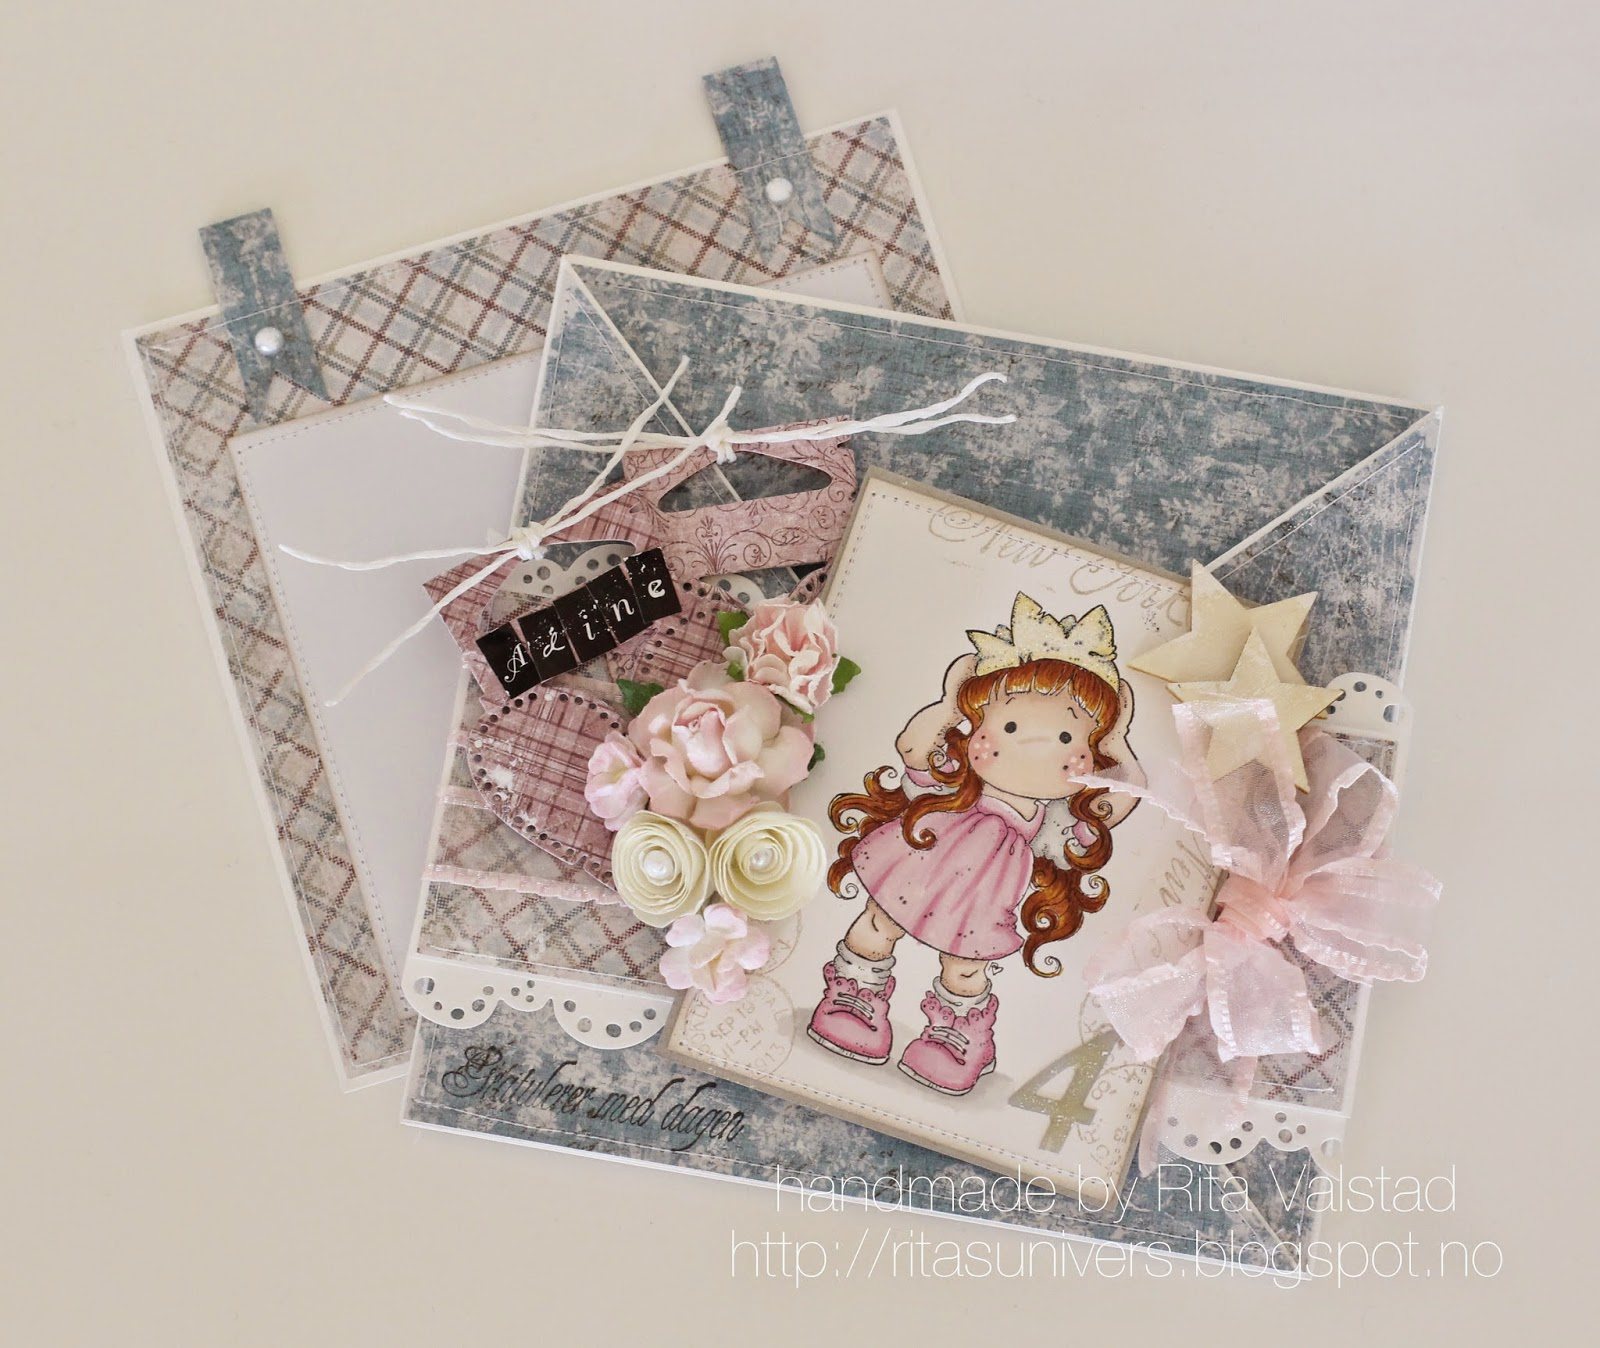 http://ritasunivers.blogspot.no/2014/08/a-princess-for-princess.html